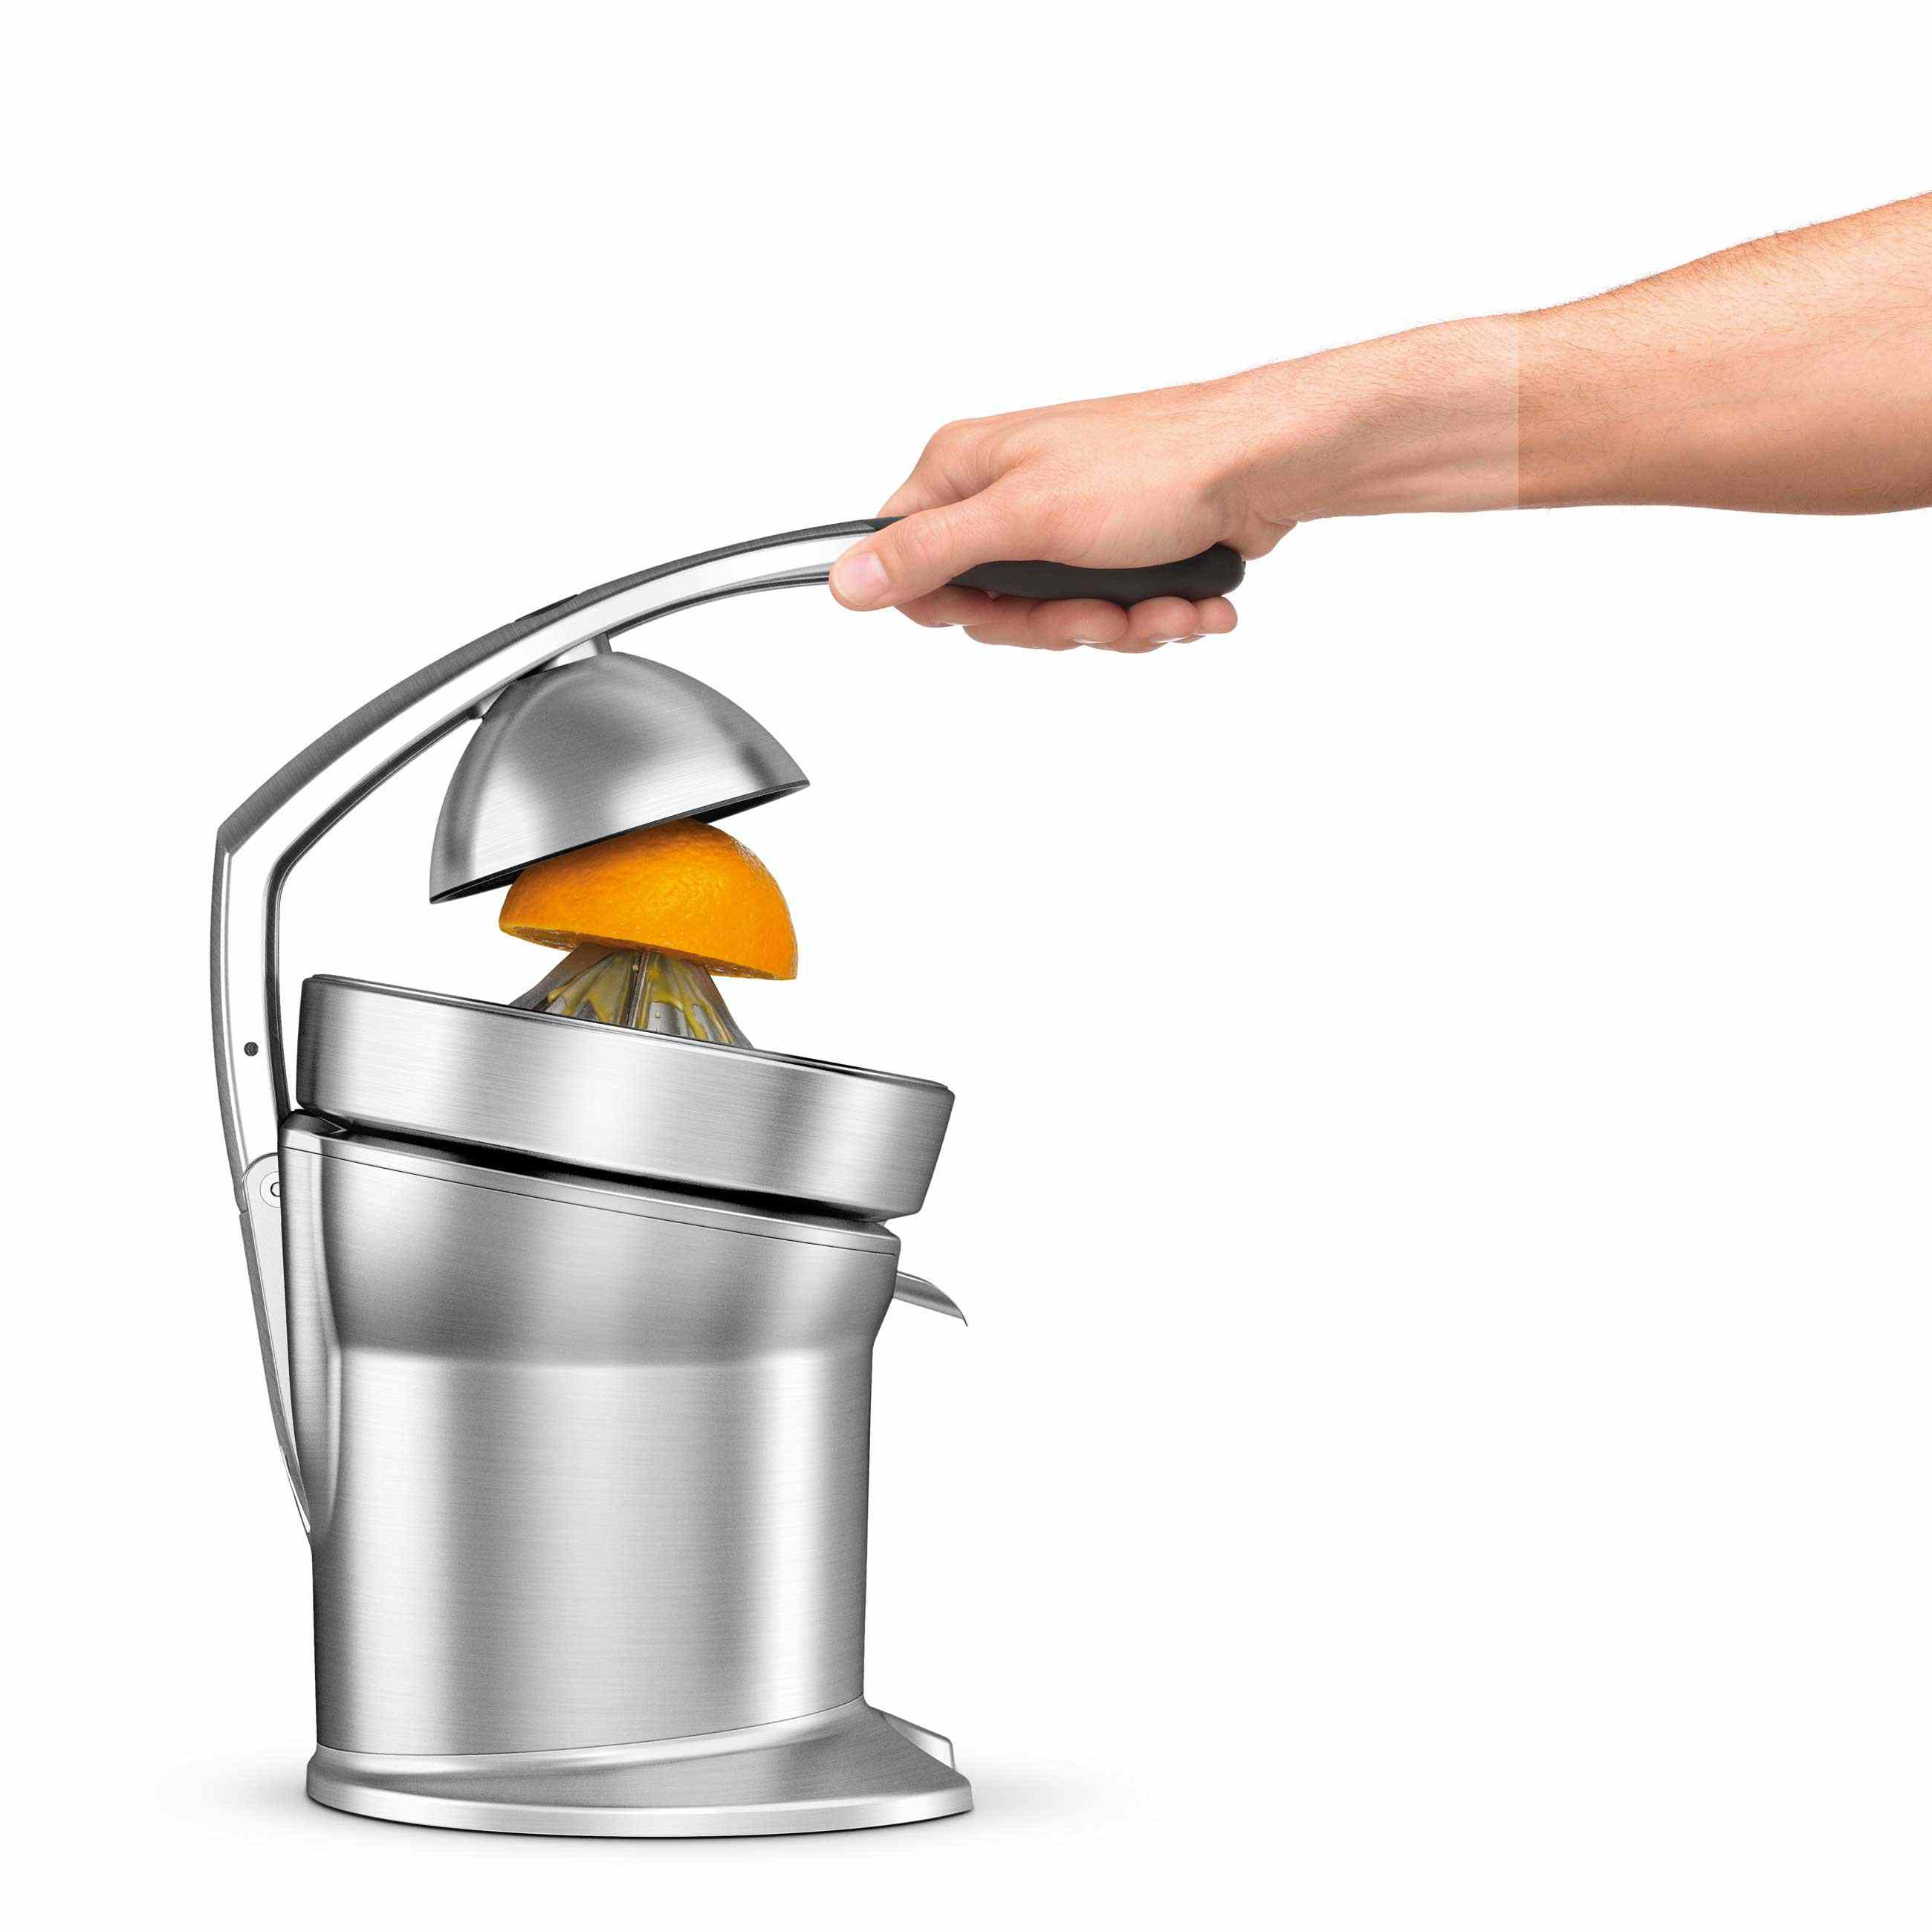 Breville Citrus Pro Juicer